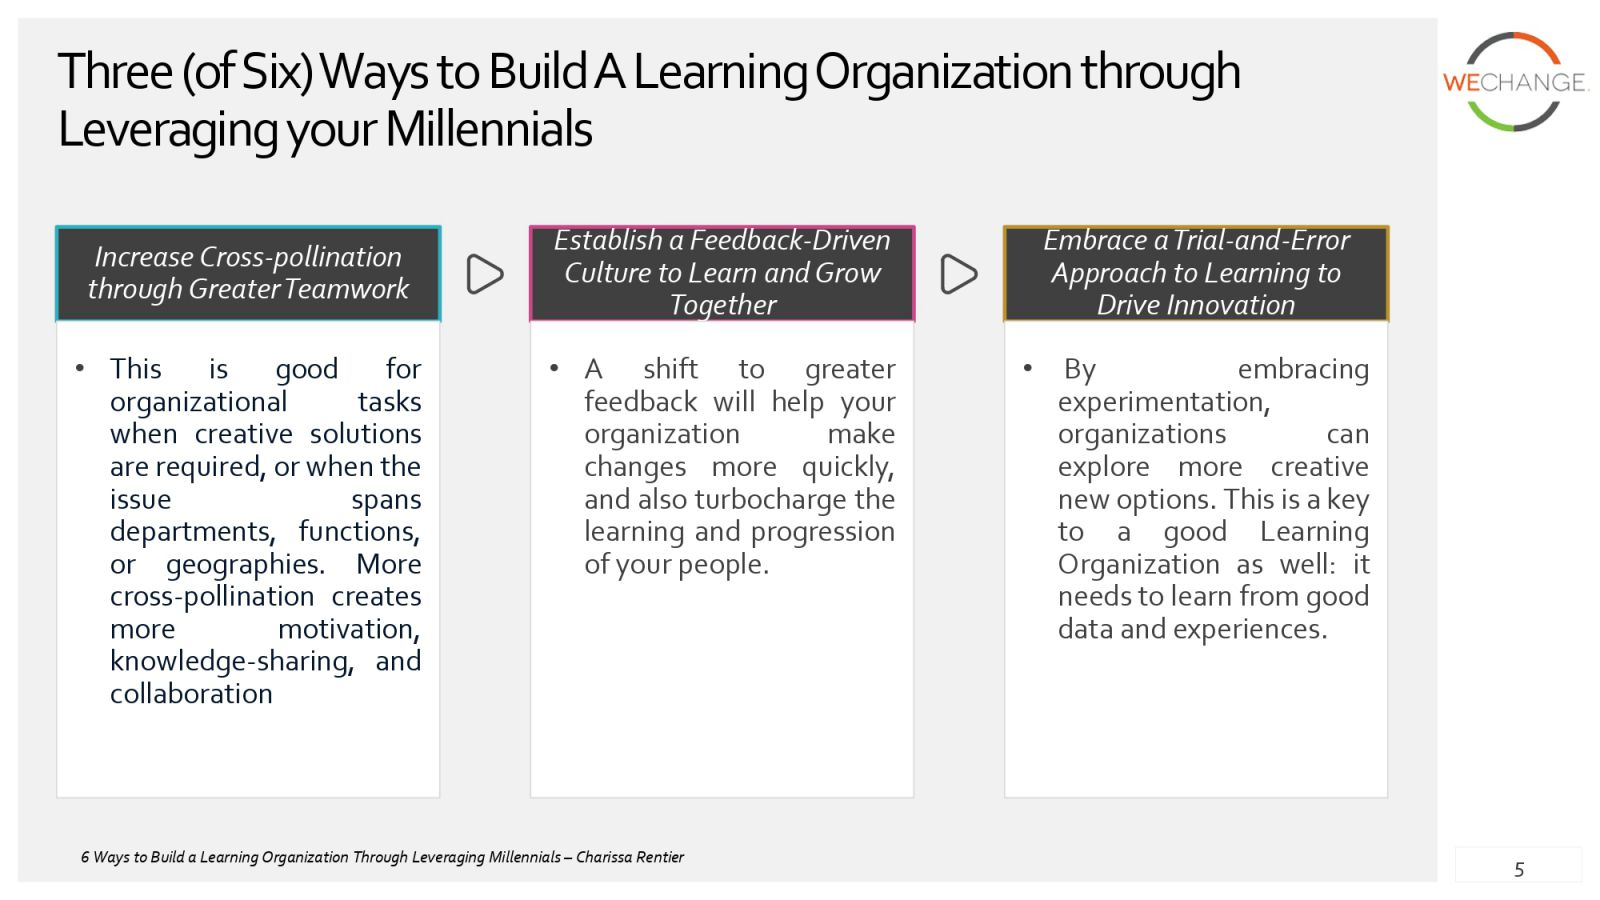 learnin organization in practice page 0005 compressed The learning organization in practice